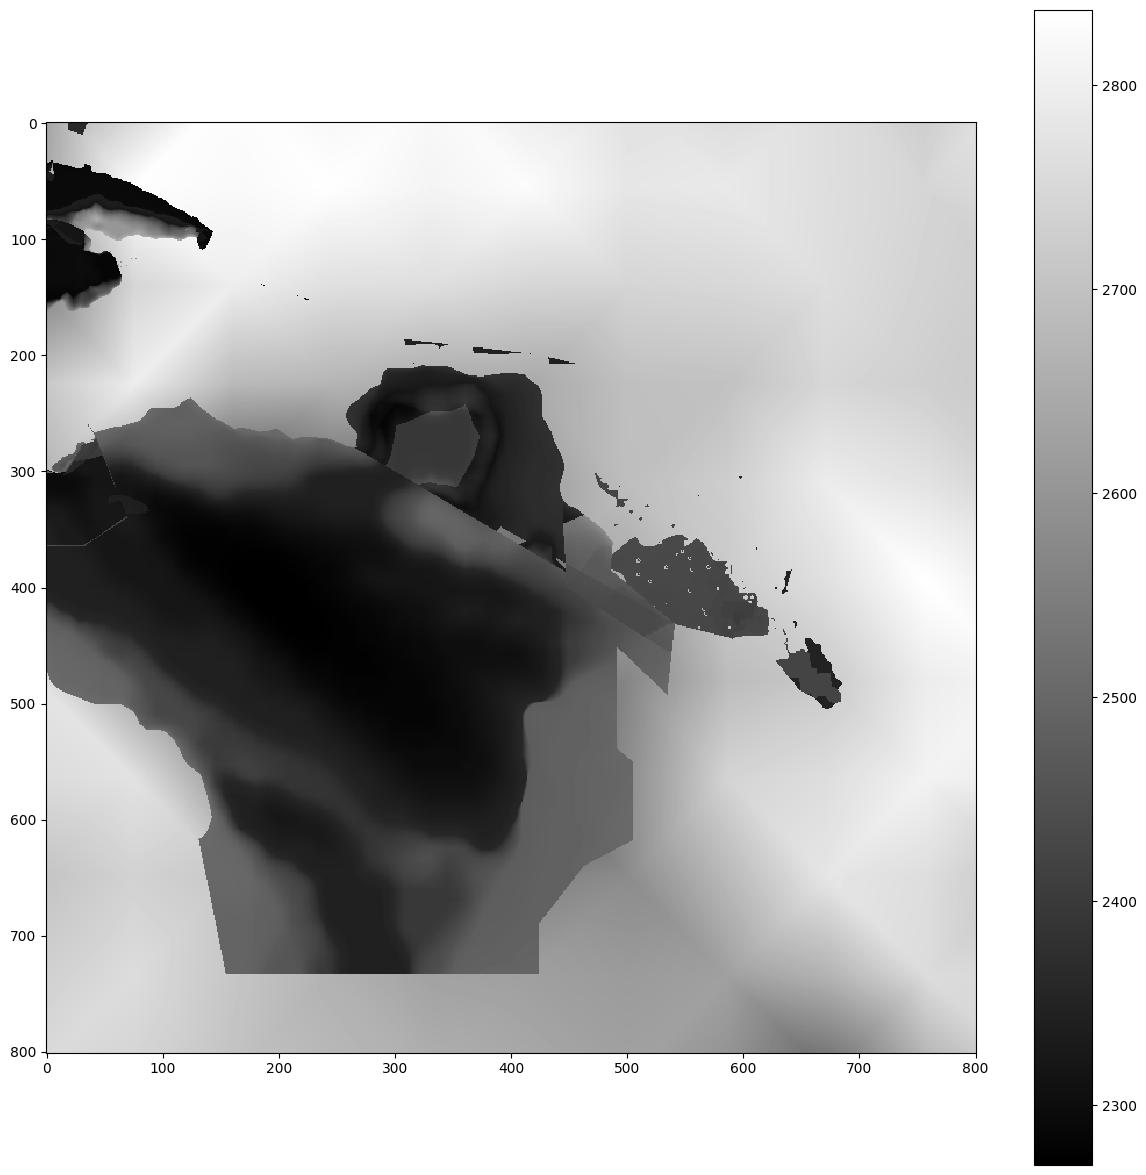 bench/seismic/wp/la_habra/meshes/velocity_model/plots/rho_1500.png